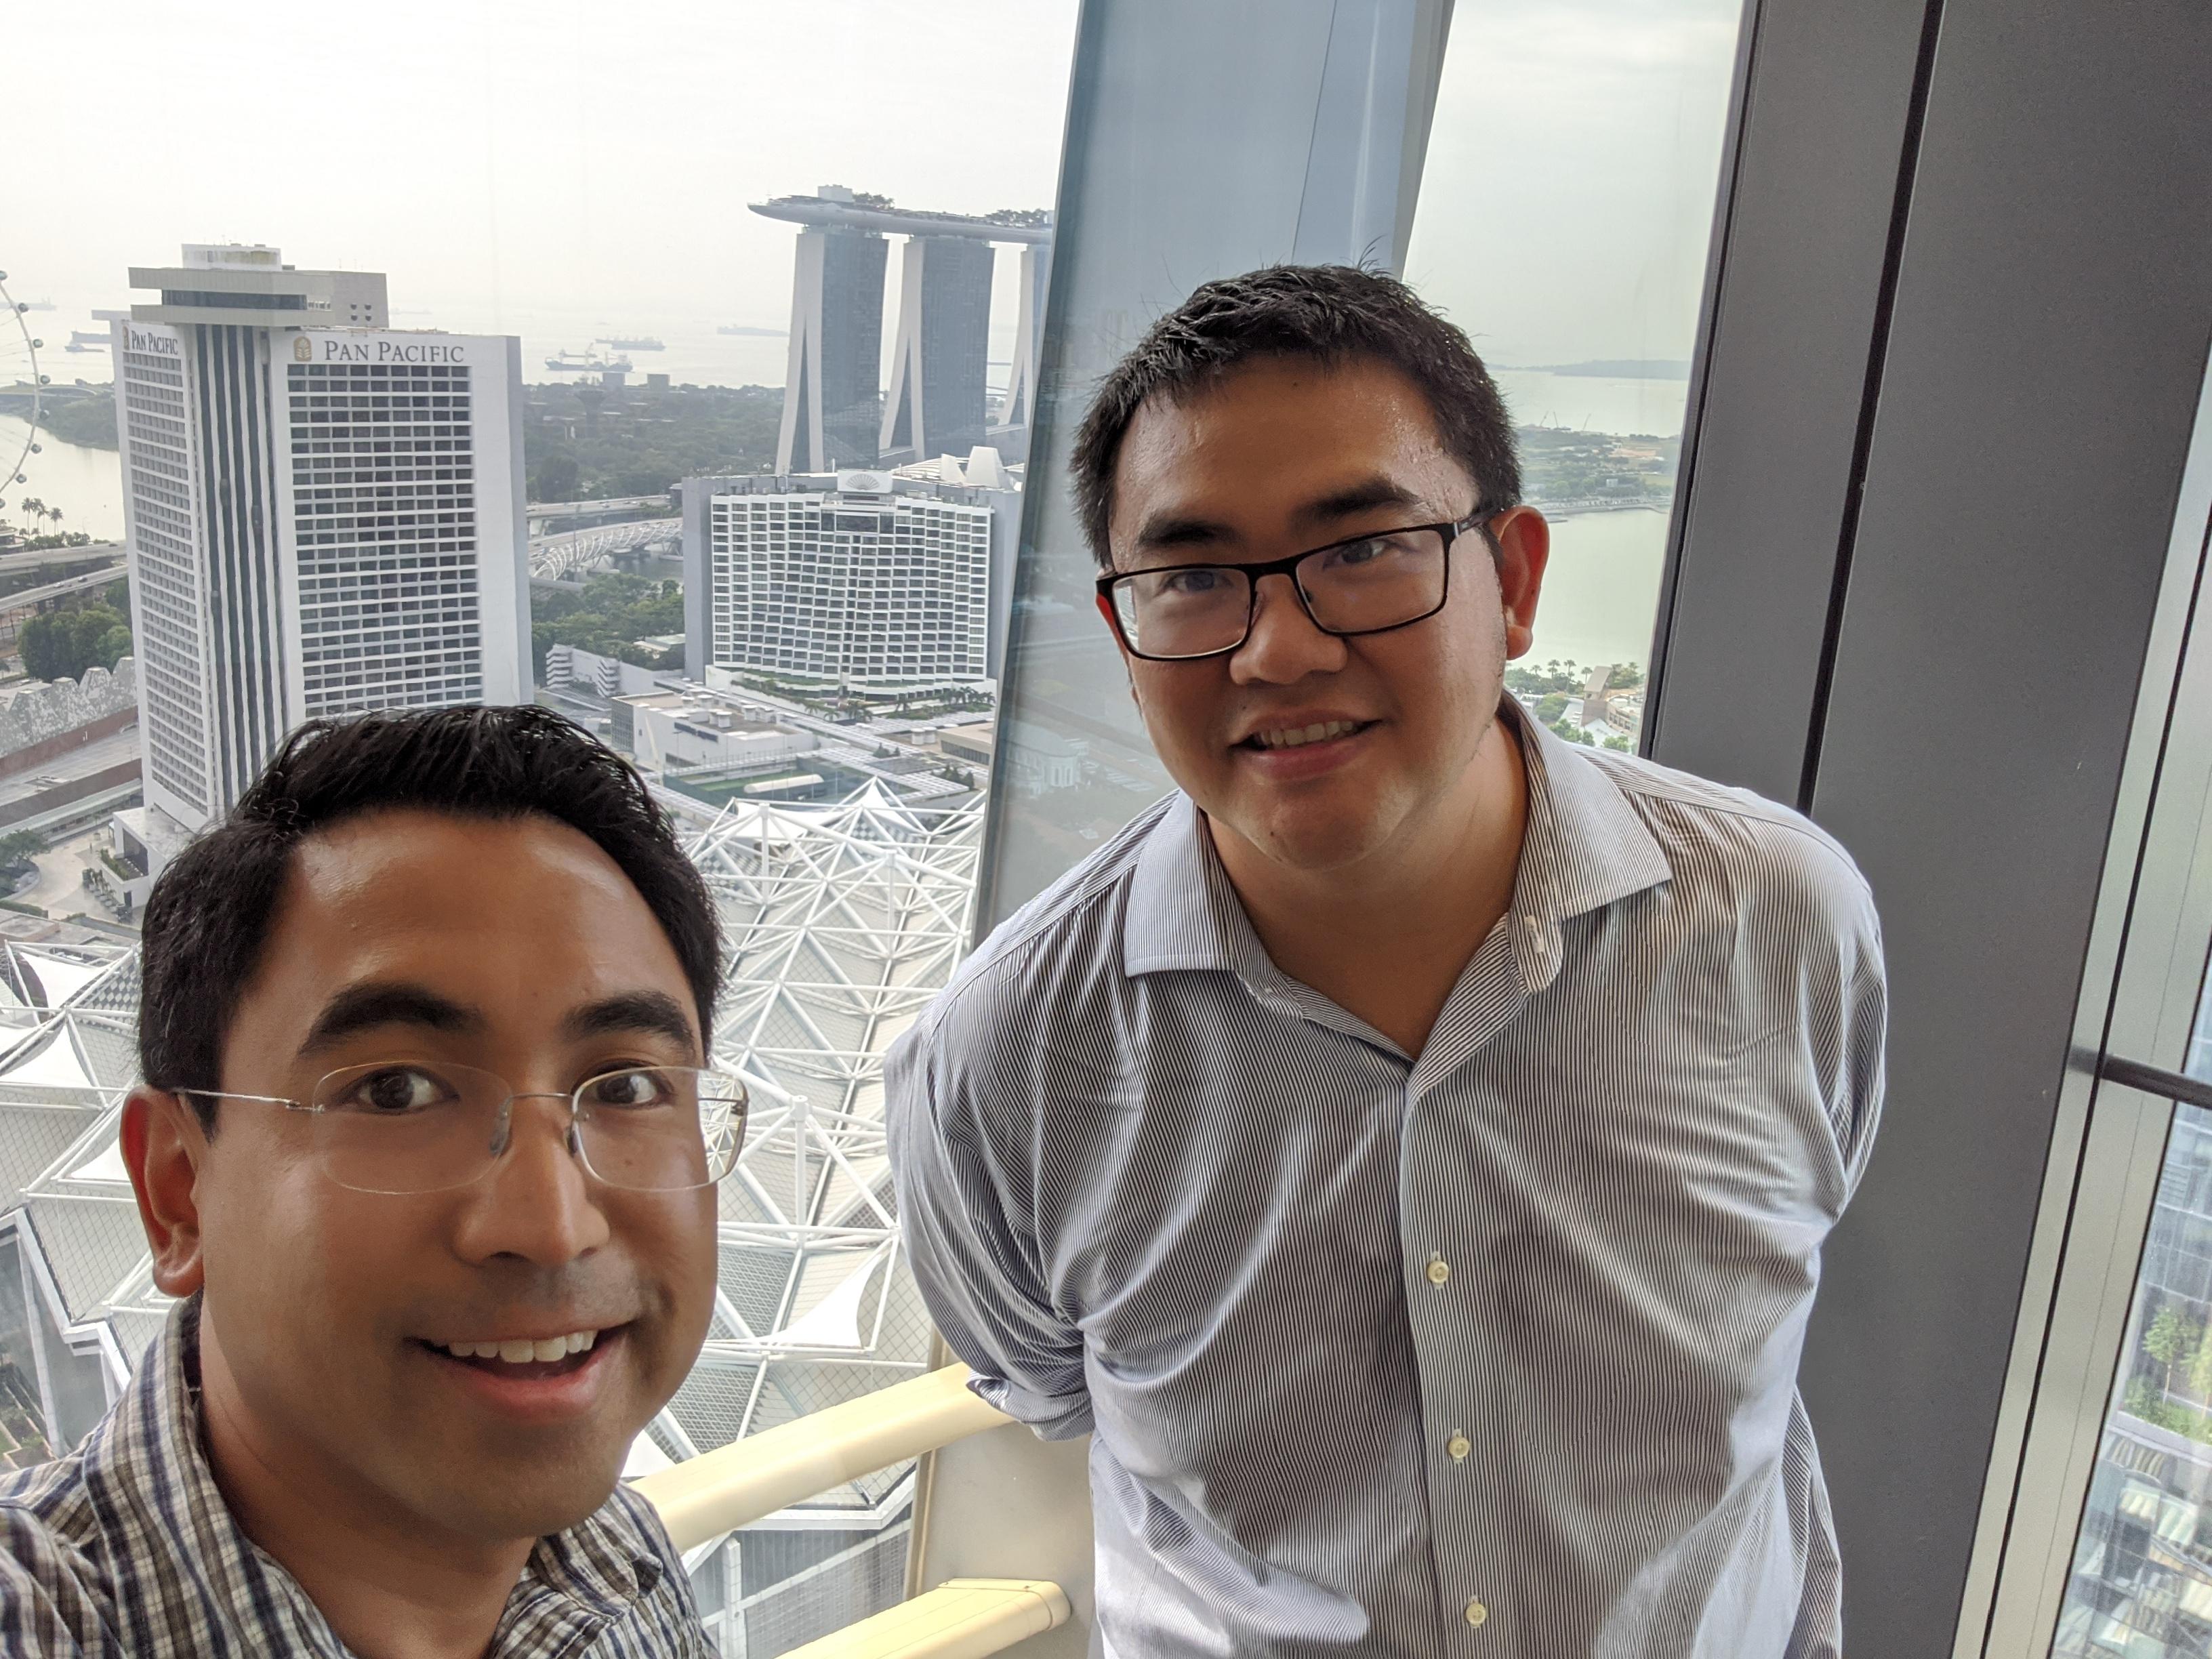 Plentina co-founders Kevin Gabayan and Earl Valencia